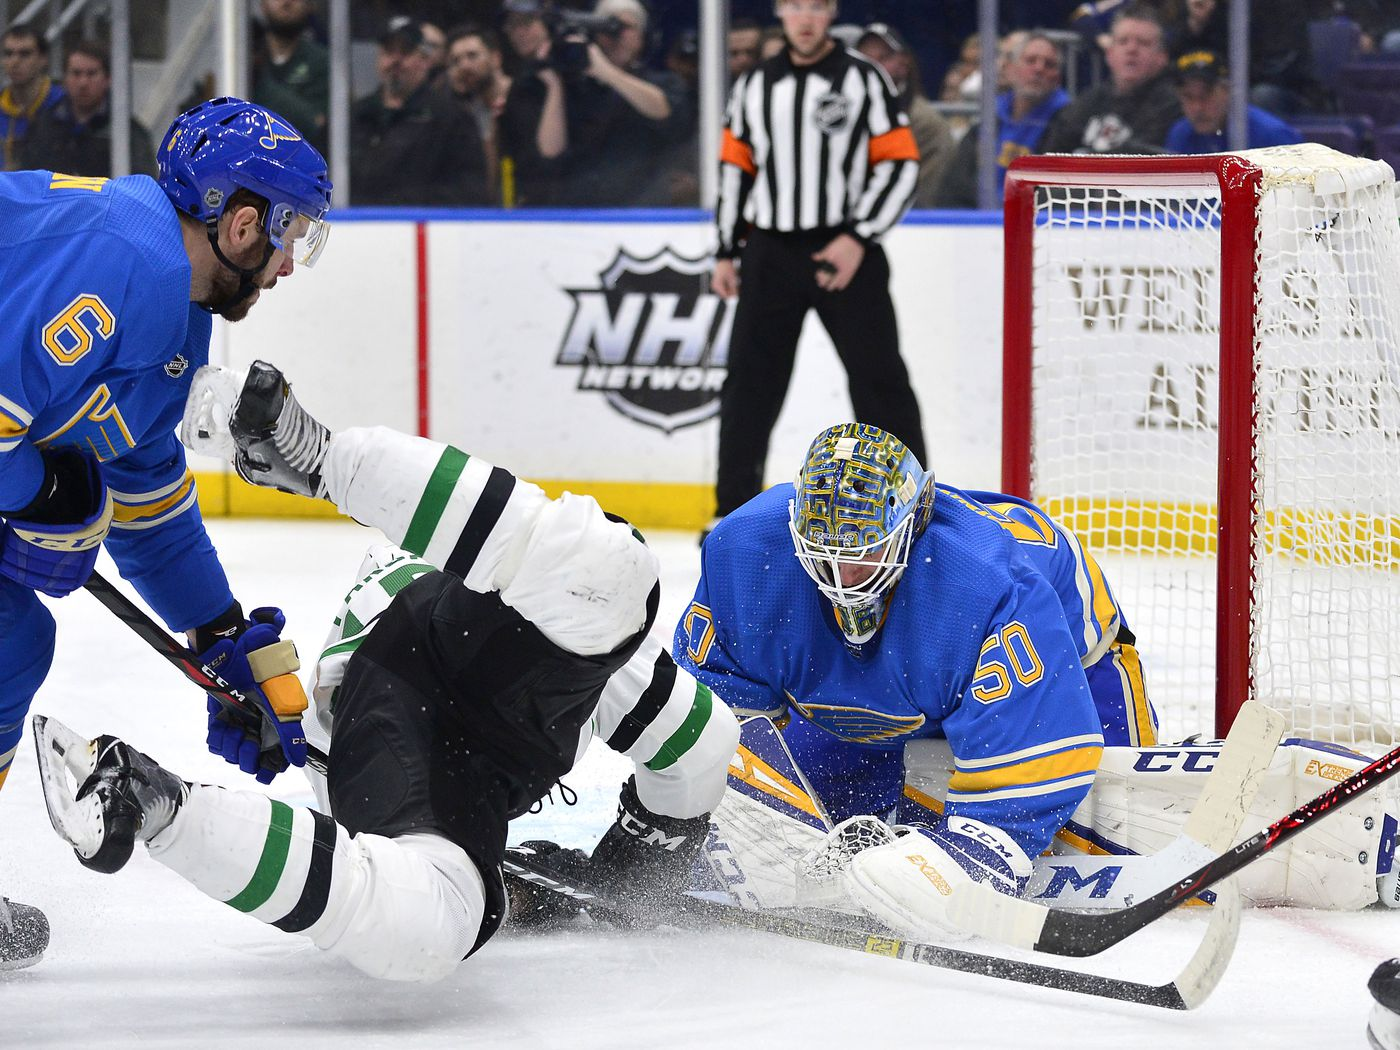 Blues Vs Stars Stanley Cup Playoff Schedule Round 2 Starts Tonight